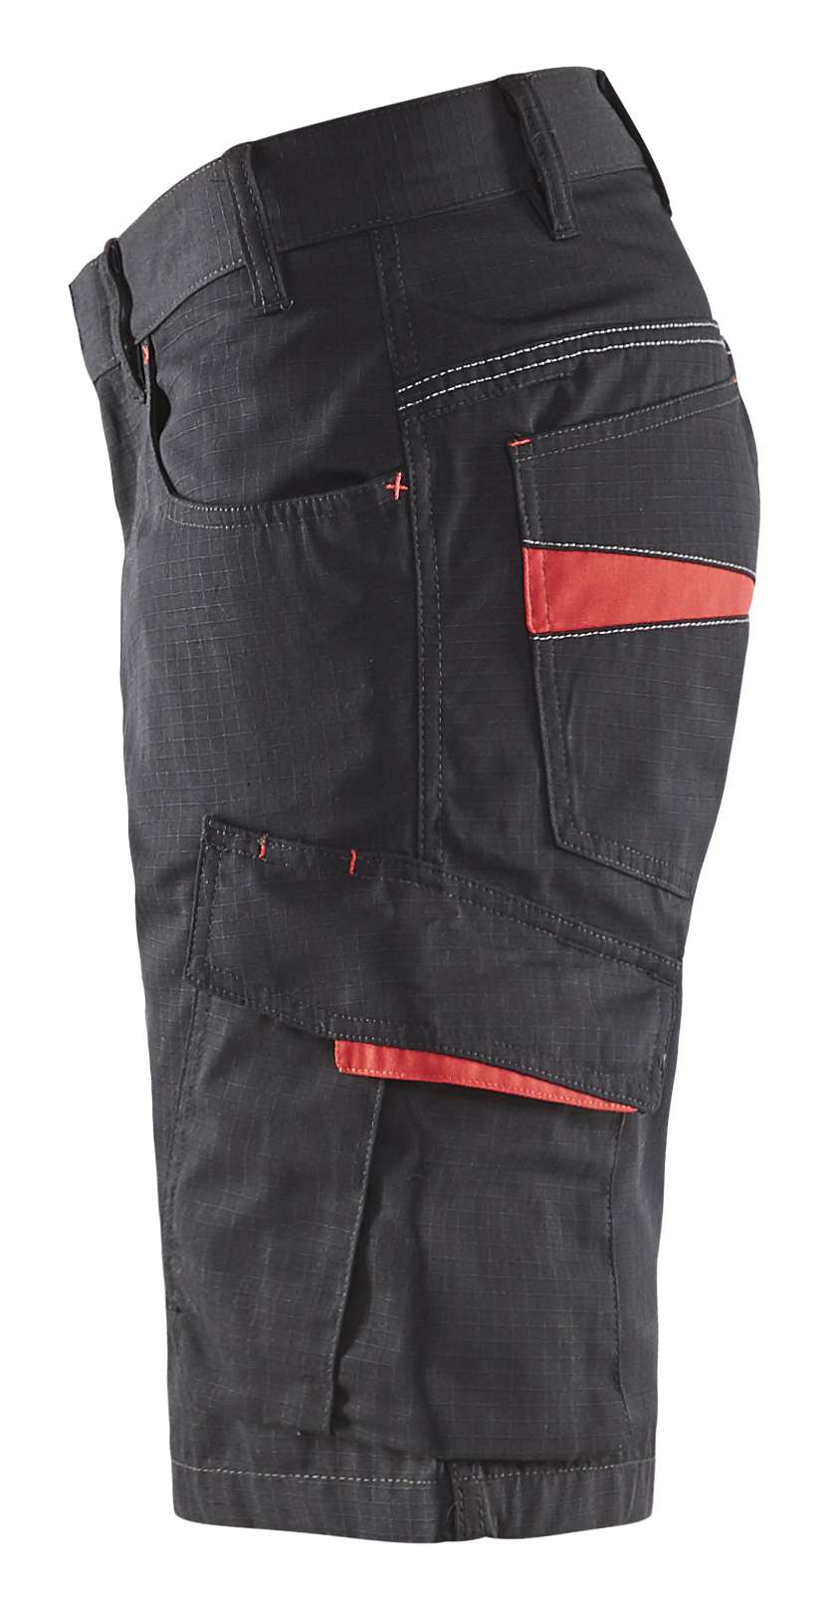 Blaklader Korte werkbroeken 14991330 zwart-rood(9956)